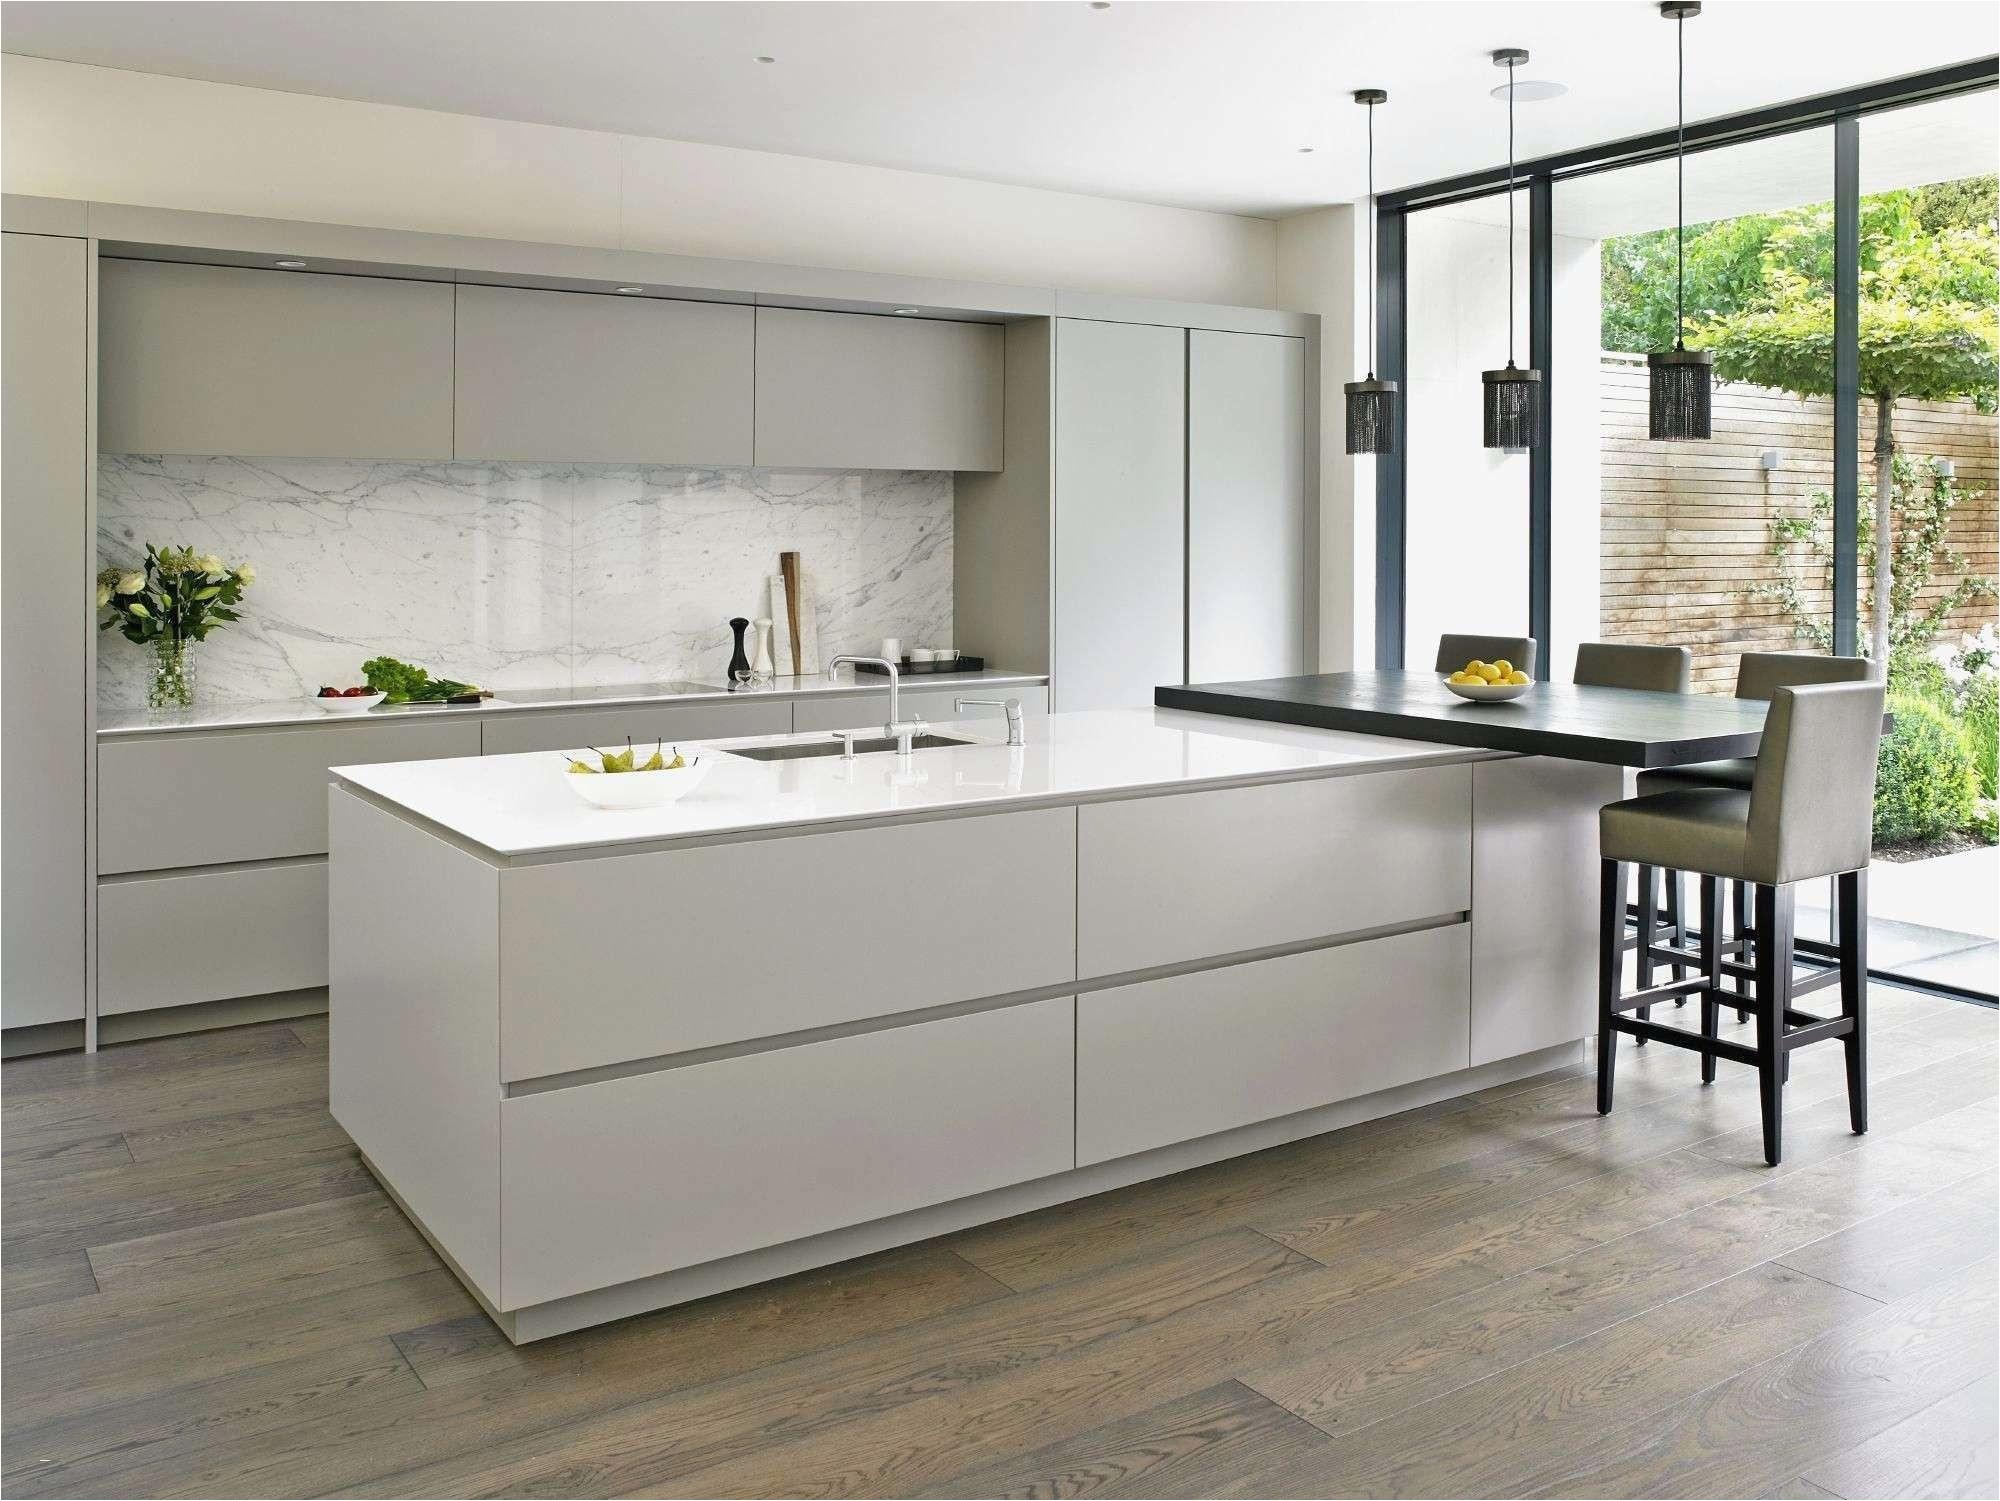 kitchen design images new morden kitchen design kitchen kitchen designing kitchen designing 0d pics